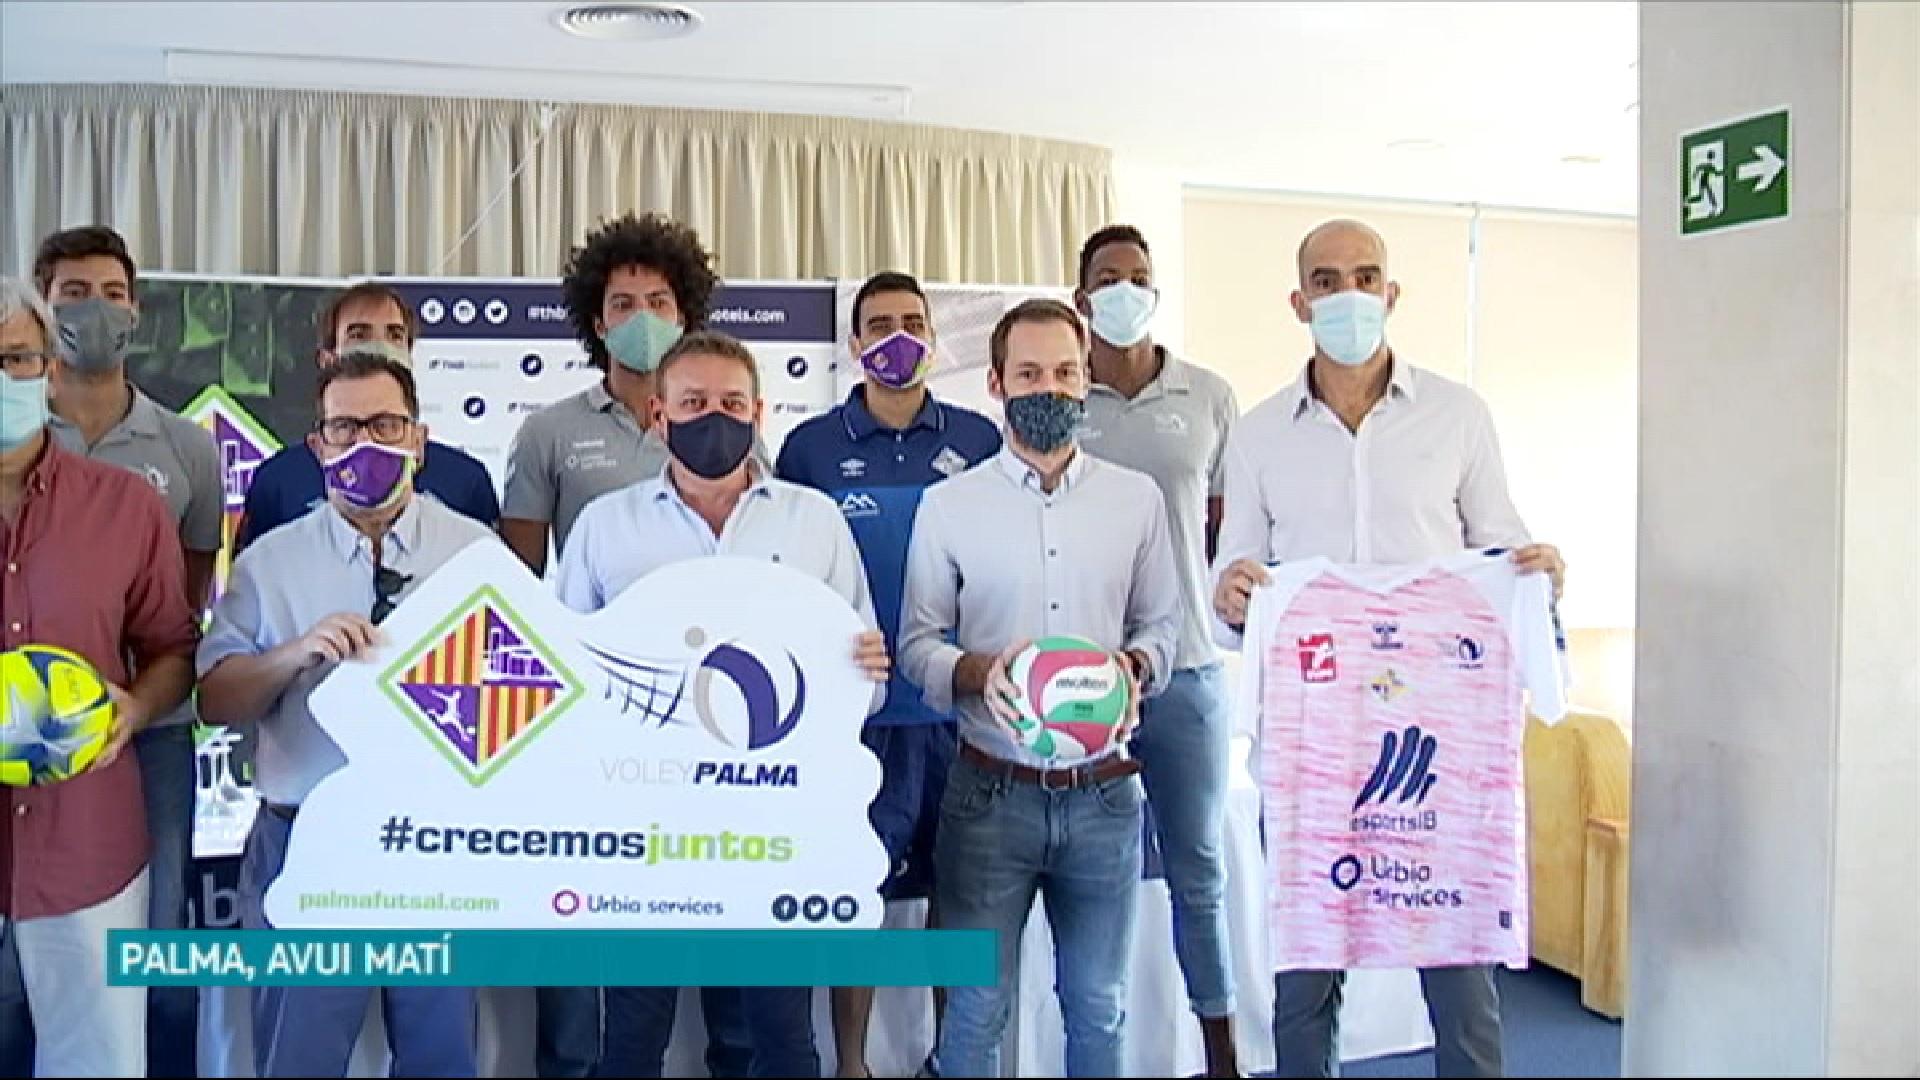 L%27Urbia+V%C3%B2lei+Palma+es+fusiona+amb+el+Palma+Futsal